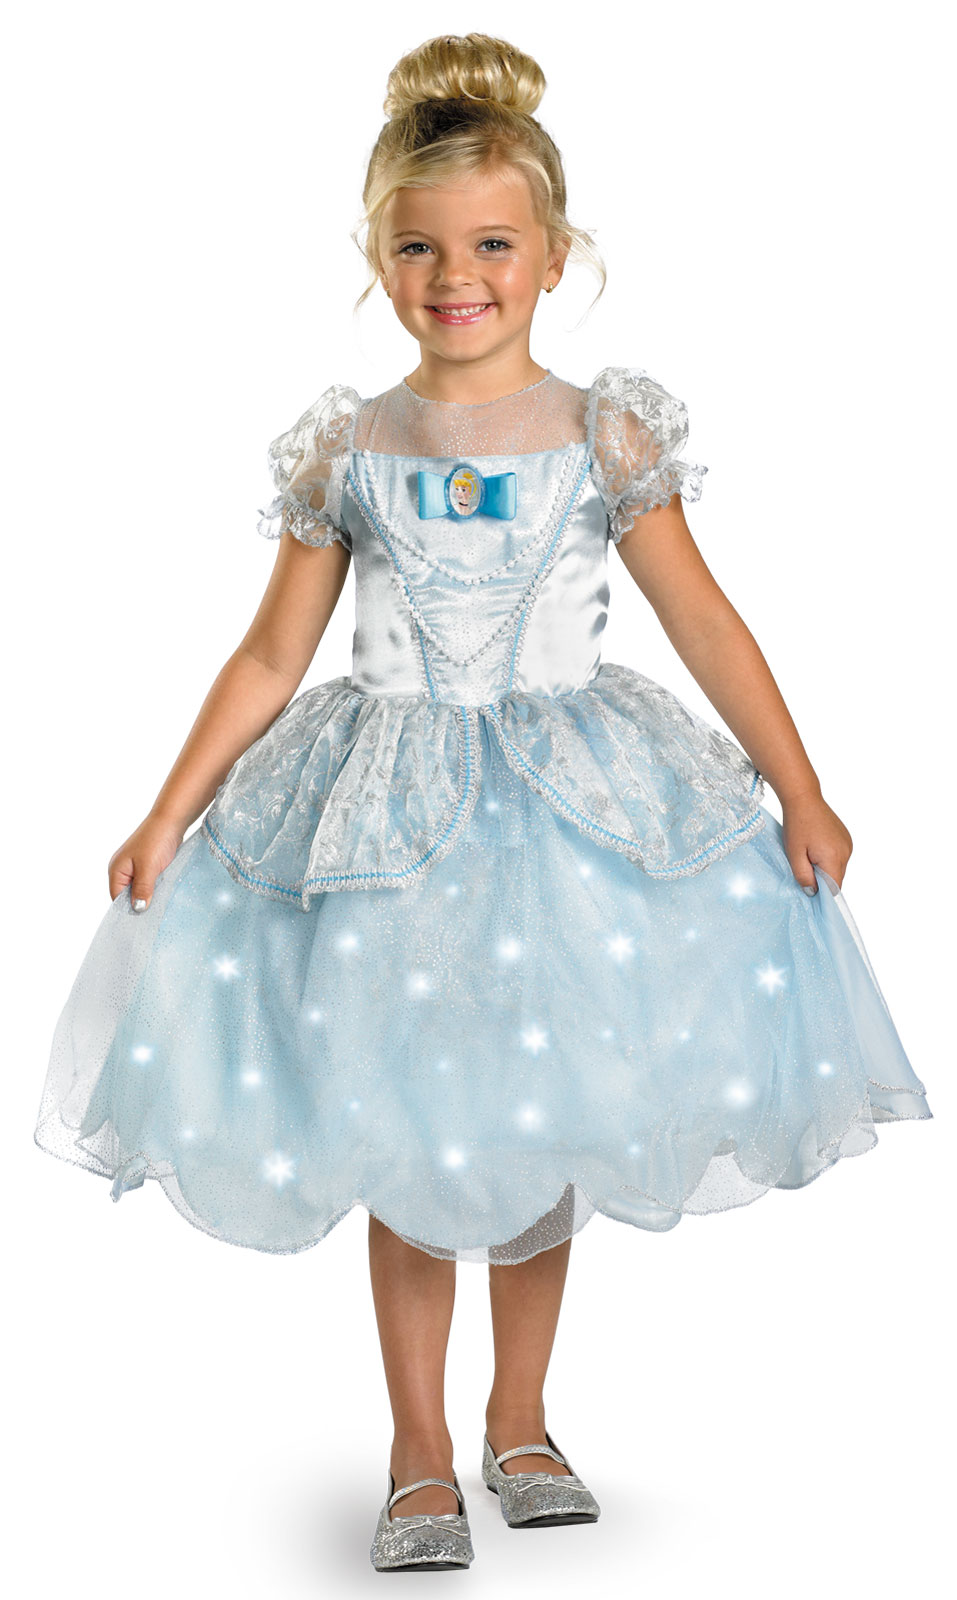 Cinderella Wedding Dress Child : Disney cinderella wedding dress child deluxe light